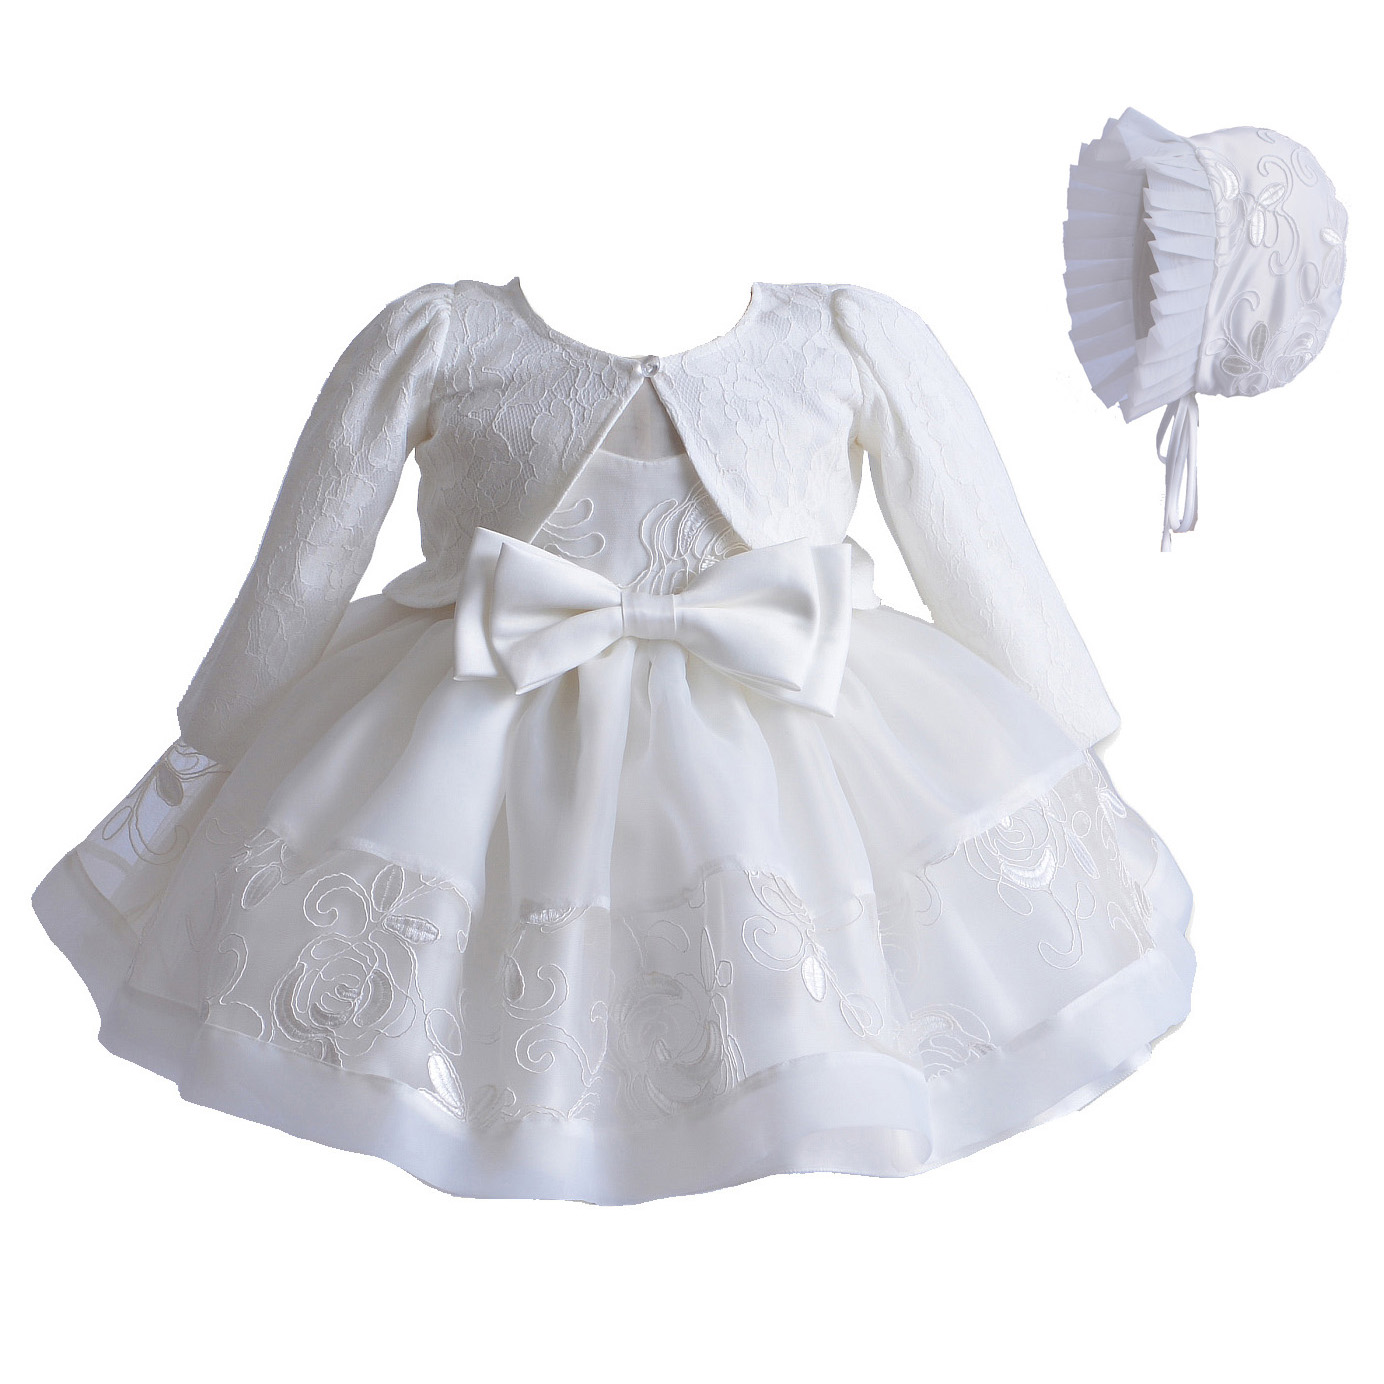 daf7ccd938e35 Baby Girls Ivory Lace Party Christening Dress Bonnet Jacket